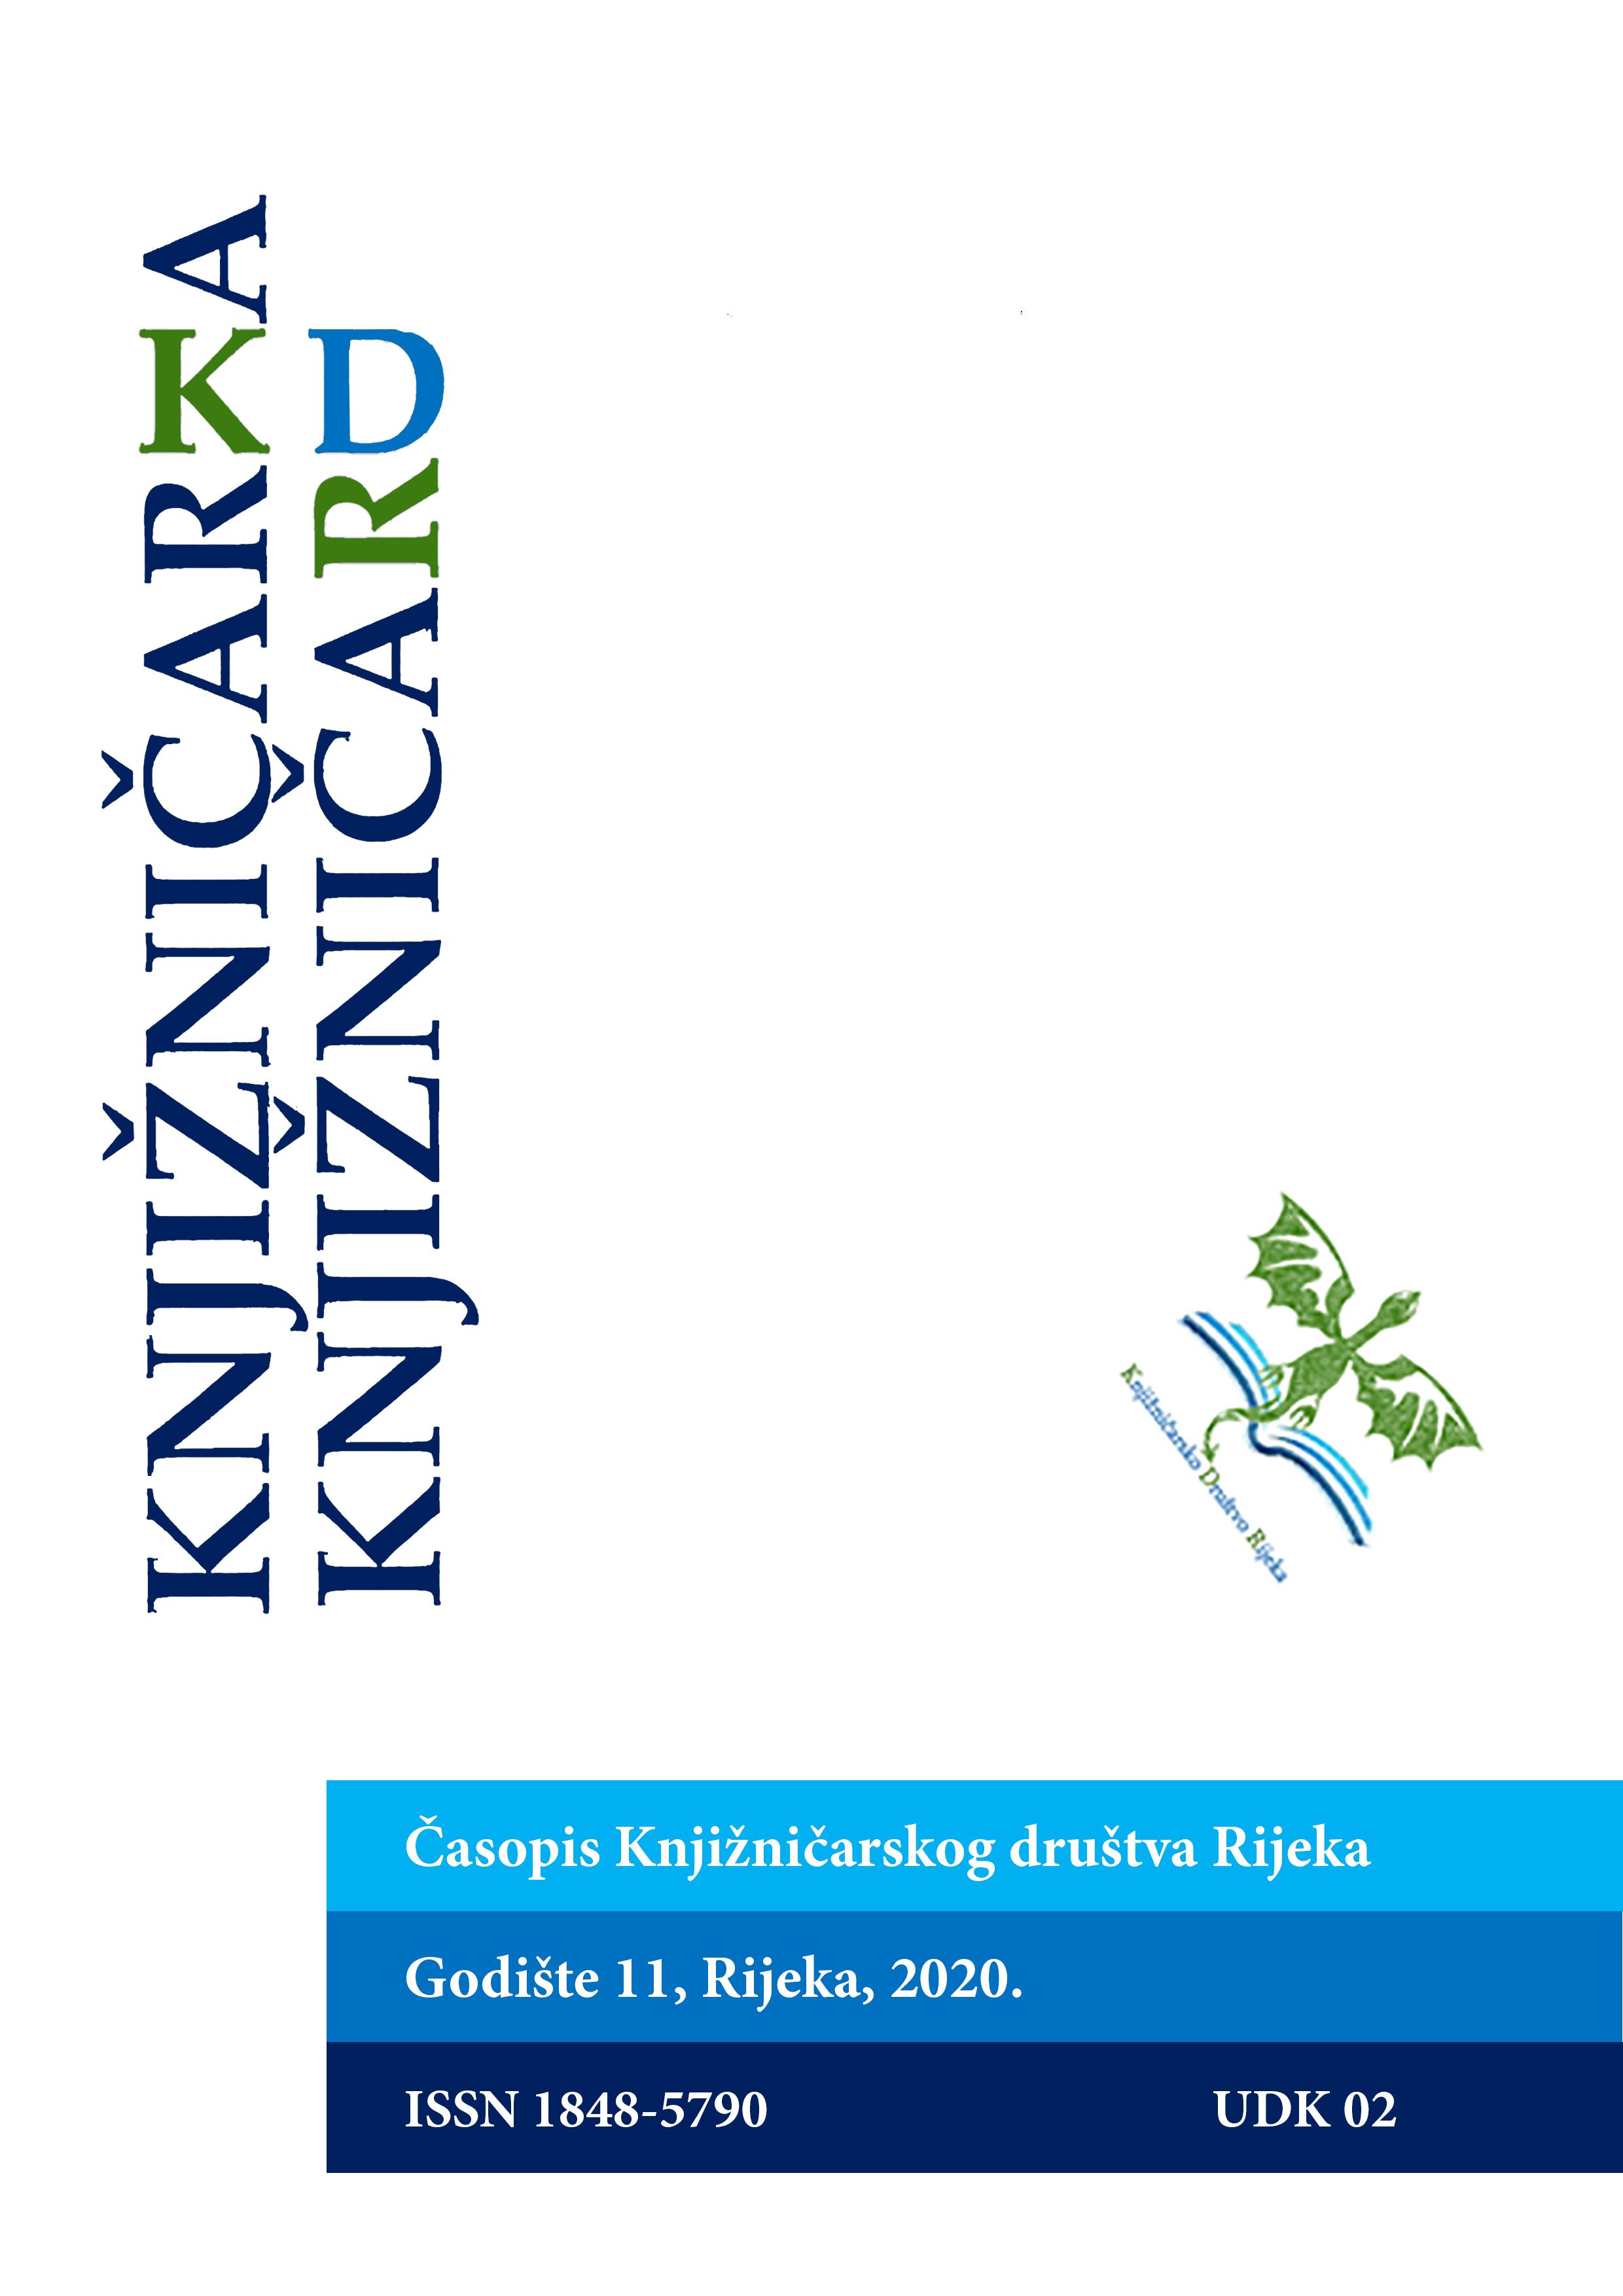 Pogledaj Svezak 11 Br. 11 (2020): Knjižničar/Knjižničarka: časopis Knjižničarskog društva Rijeka